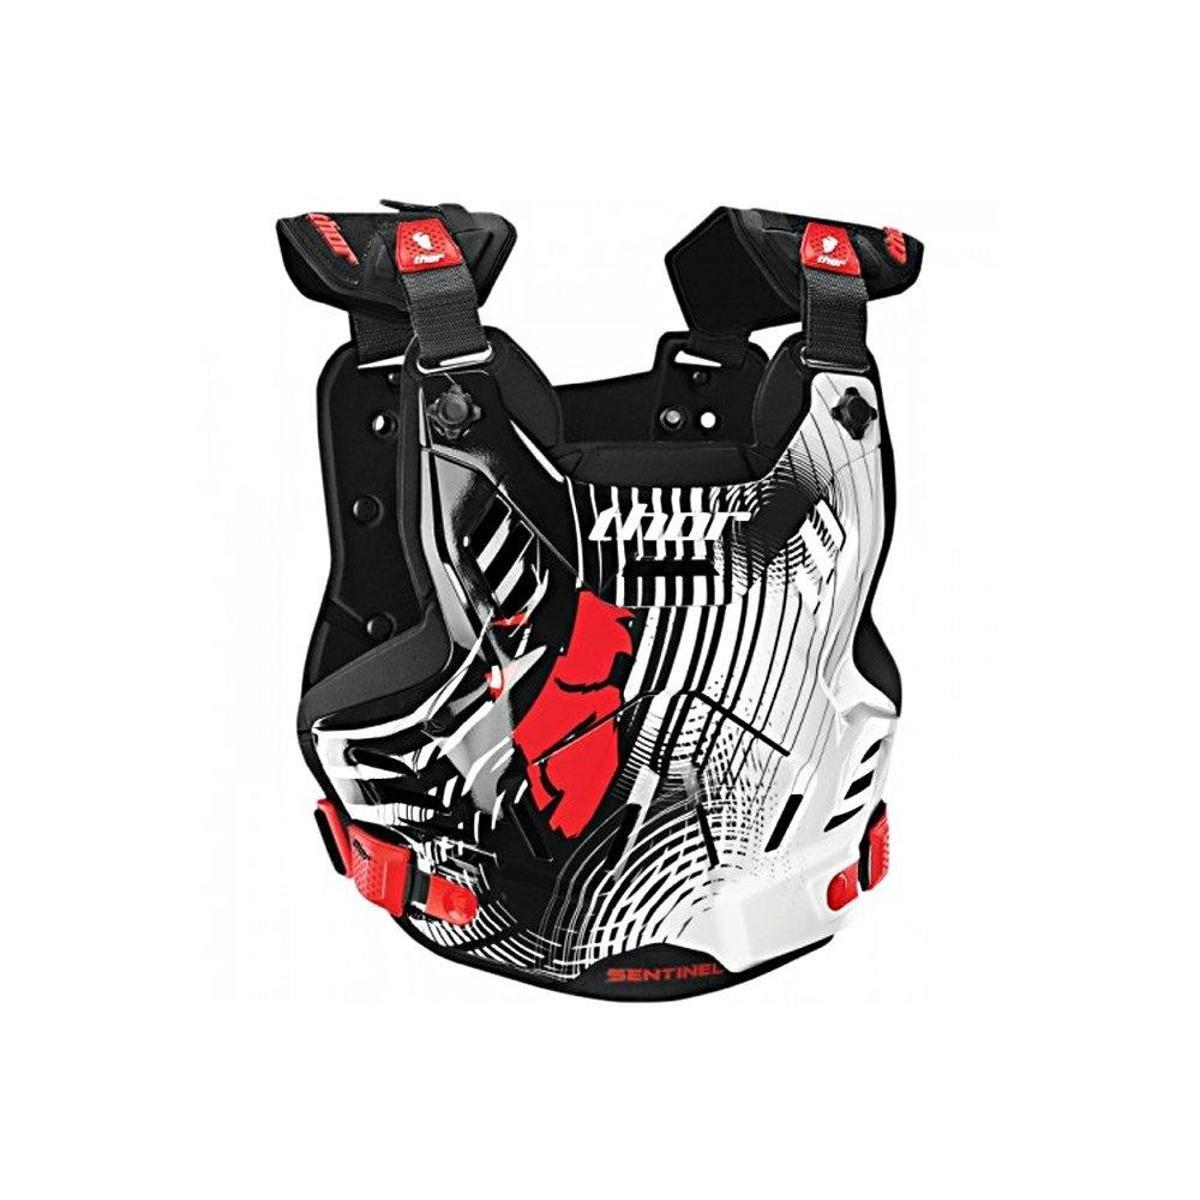 Colete Para Motocross Thor Sentinel Xp Mask Wrap - Compre Agora ... d7ed4413b77